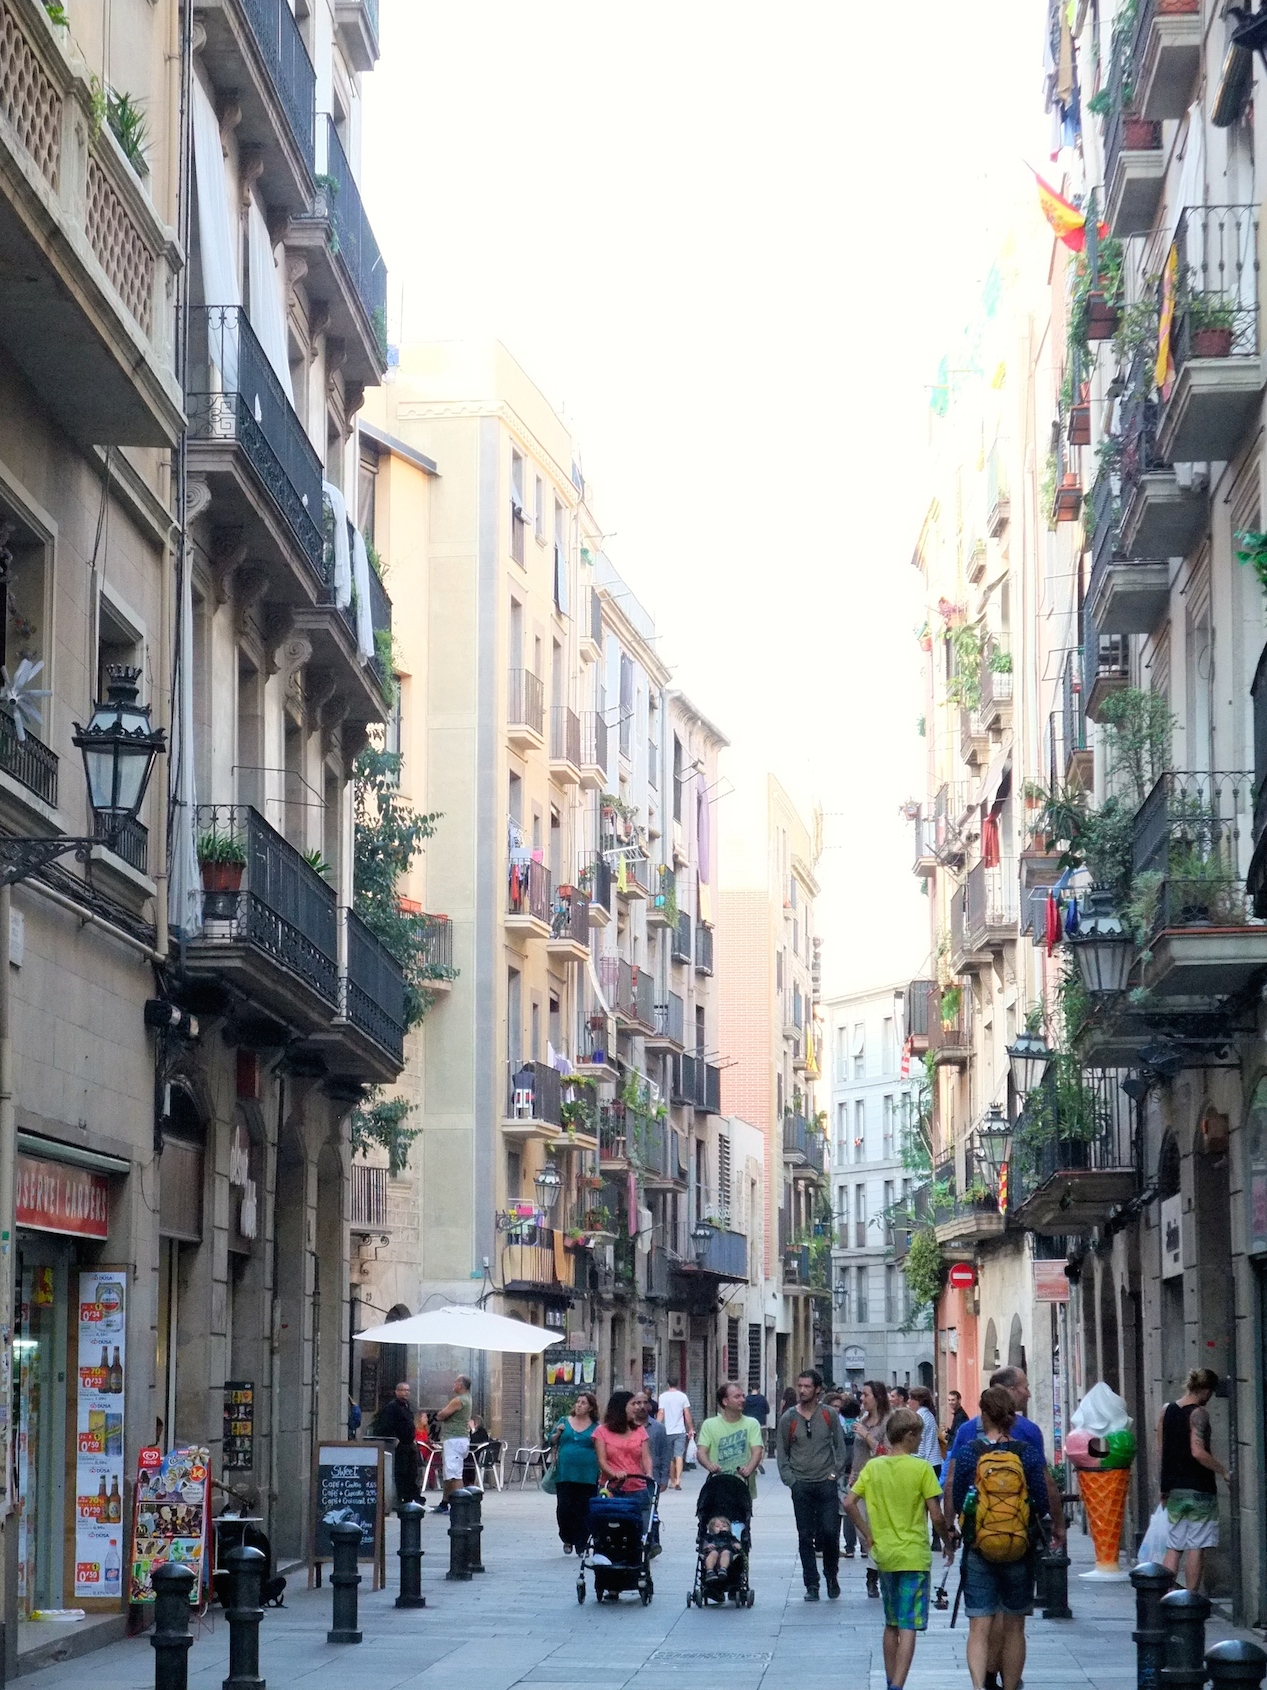 Walking around the center of Barcelona